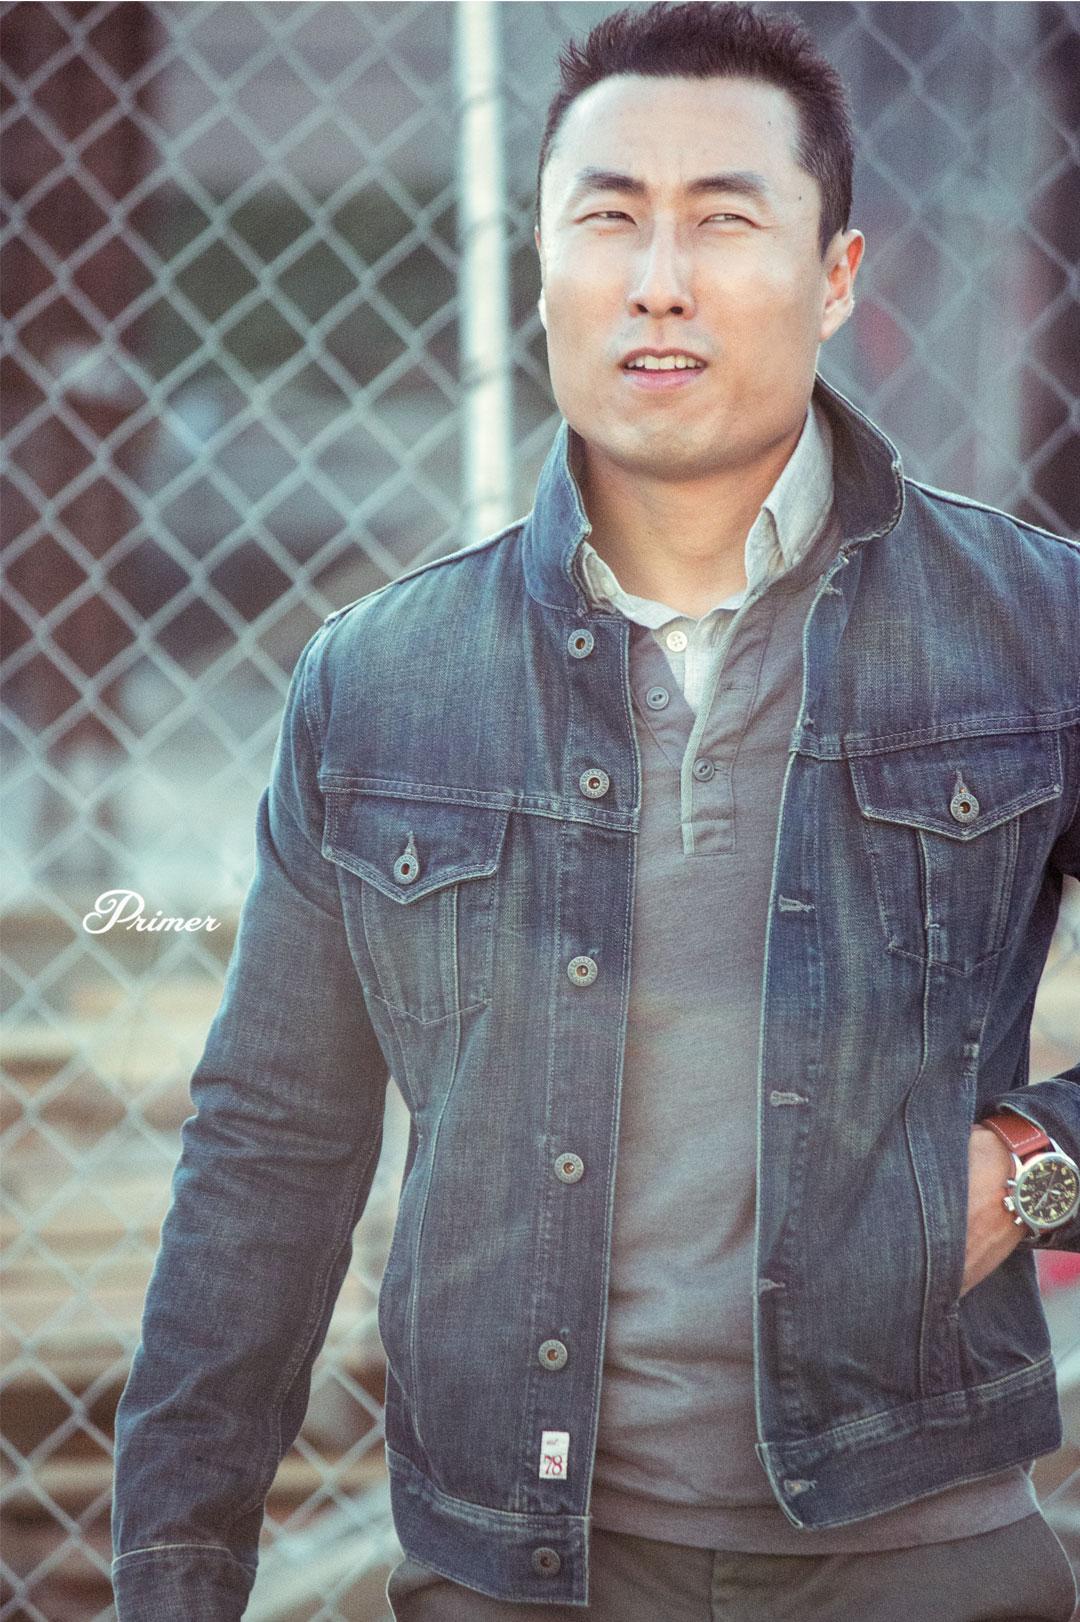 men rugged style - Shop the Look @ PrimerMagazine.com